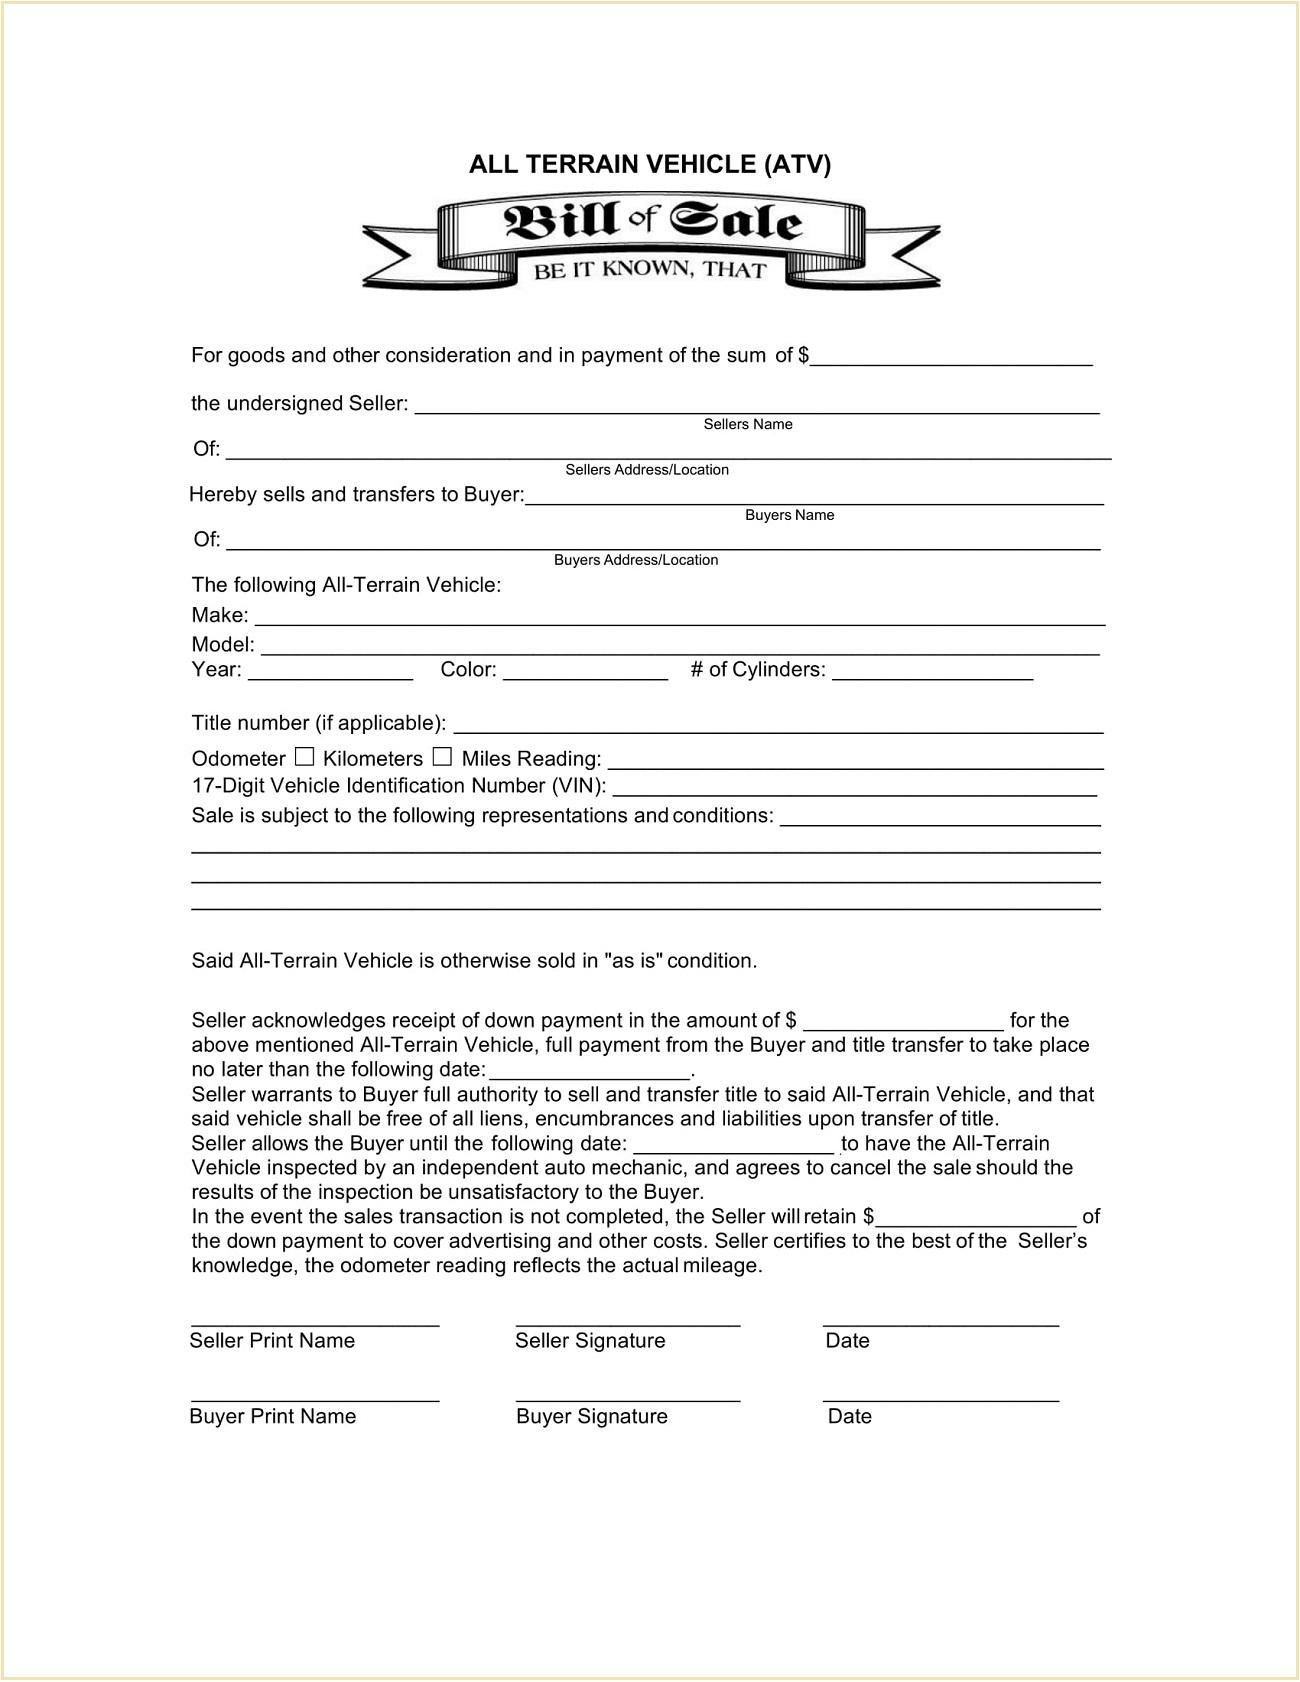 ATV Bill Of Sale Form Template PDF Atv Pa Mn Oregon No Title Wisconsin  Example All-Terrain Vehicle (ATV) Full